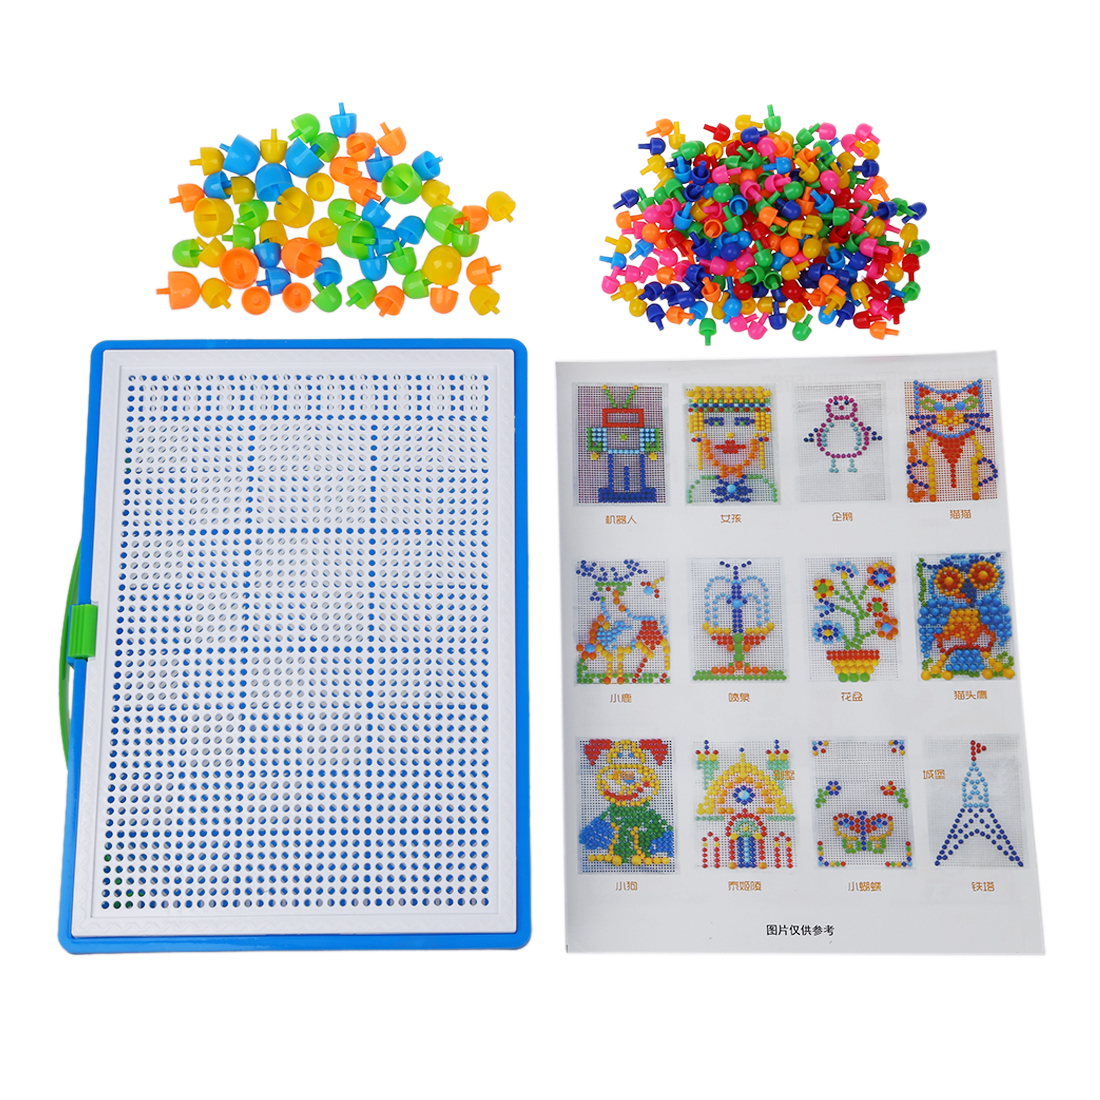 HOT SALE 296 Mushroom Nail Intelligent 3D Puzzle Games DIY Mushroom Nail Plastic Flashboard Children Toys Educational Toy rand